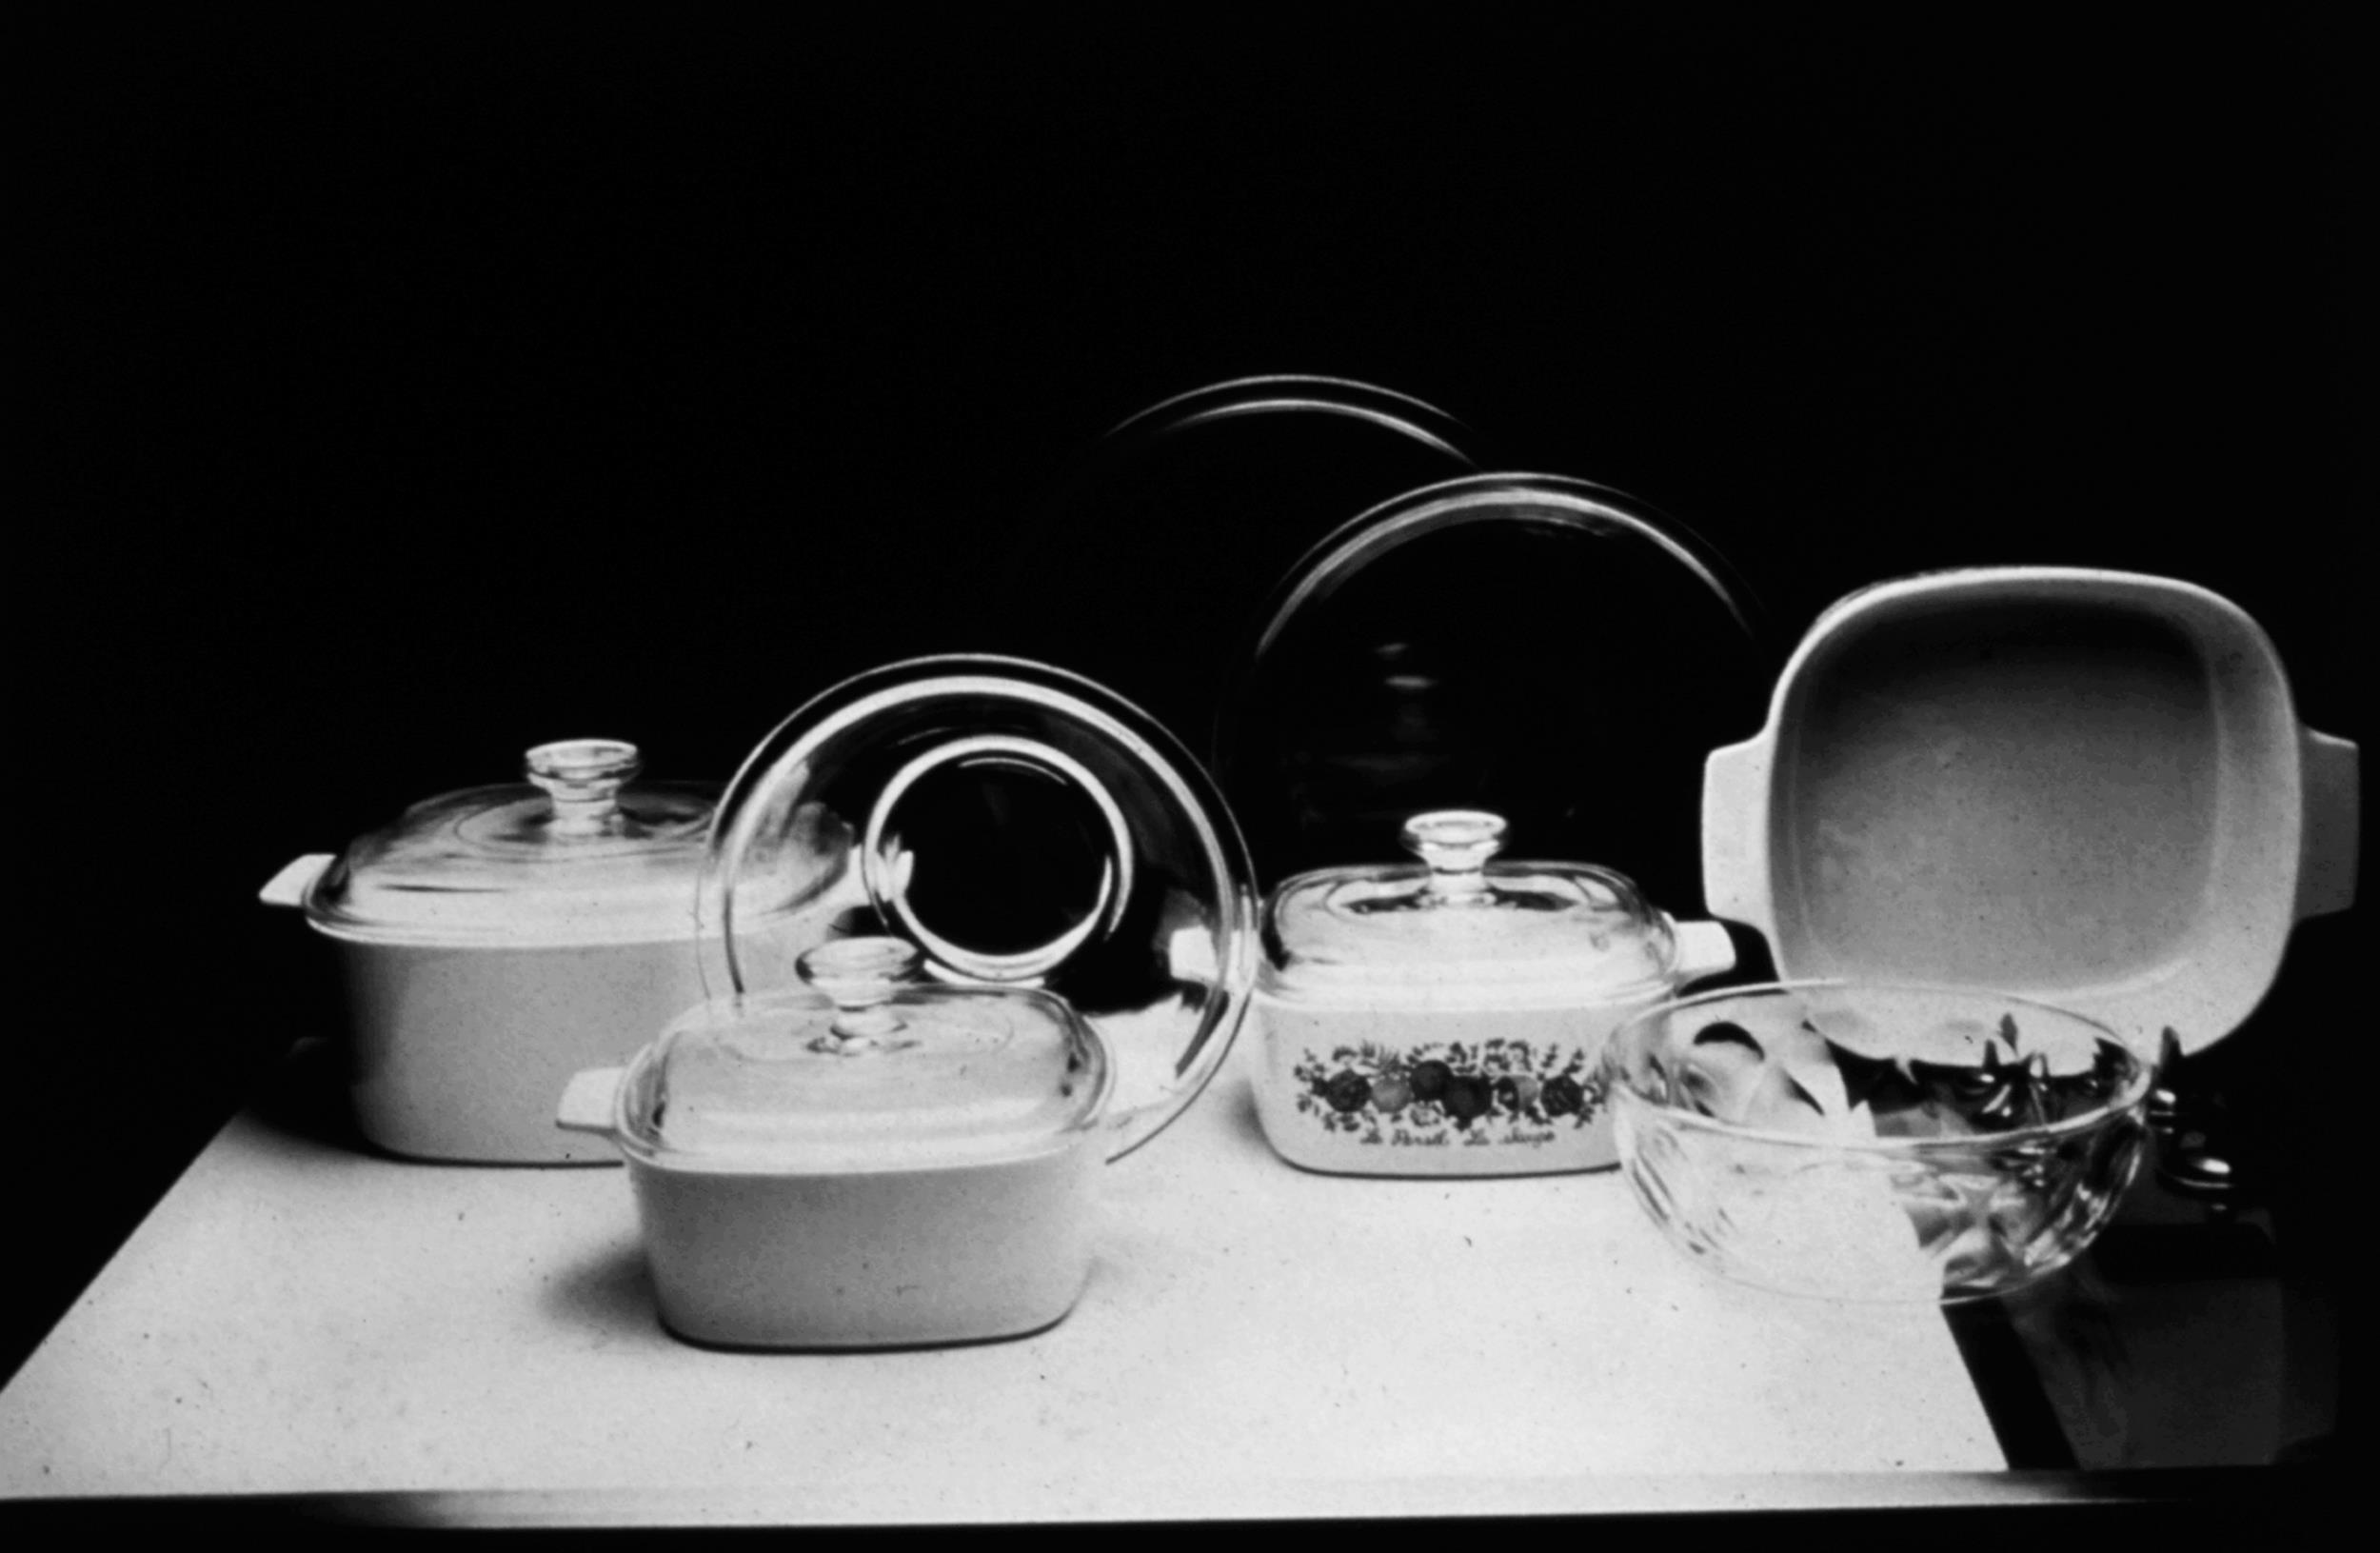 Inventor Of Corningware Glass Dies In New York